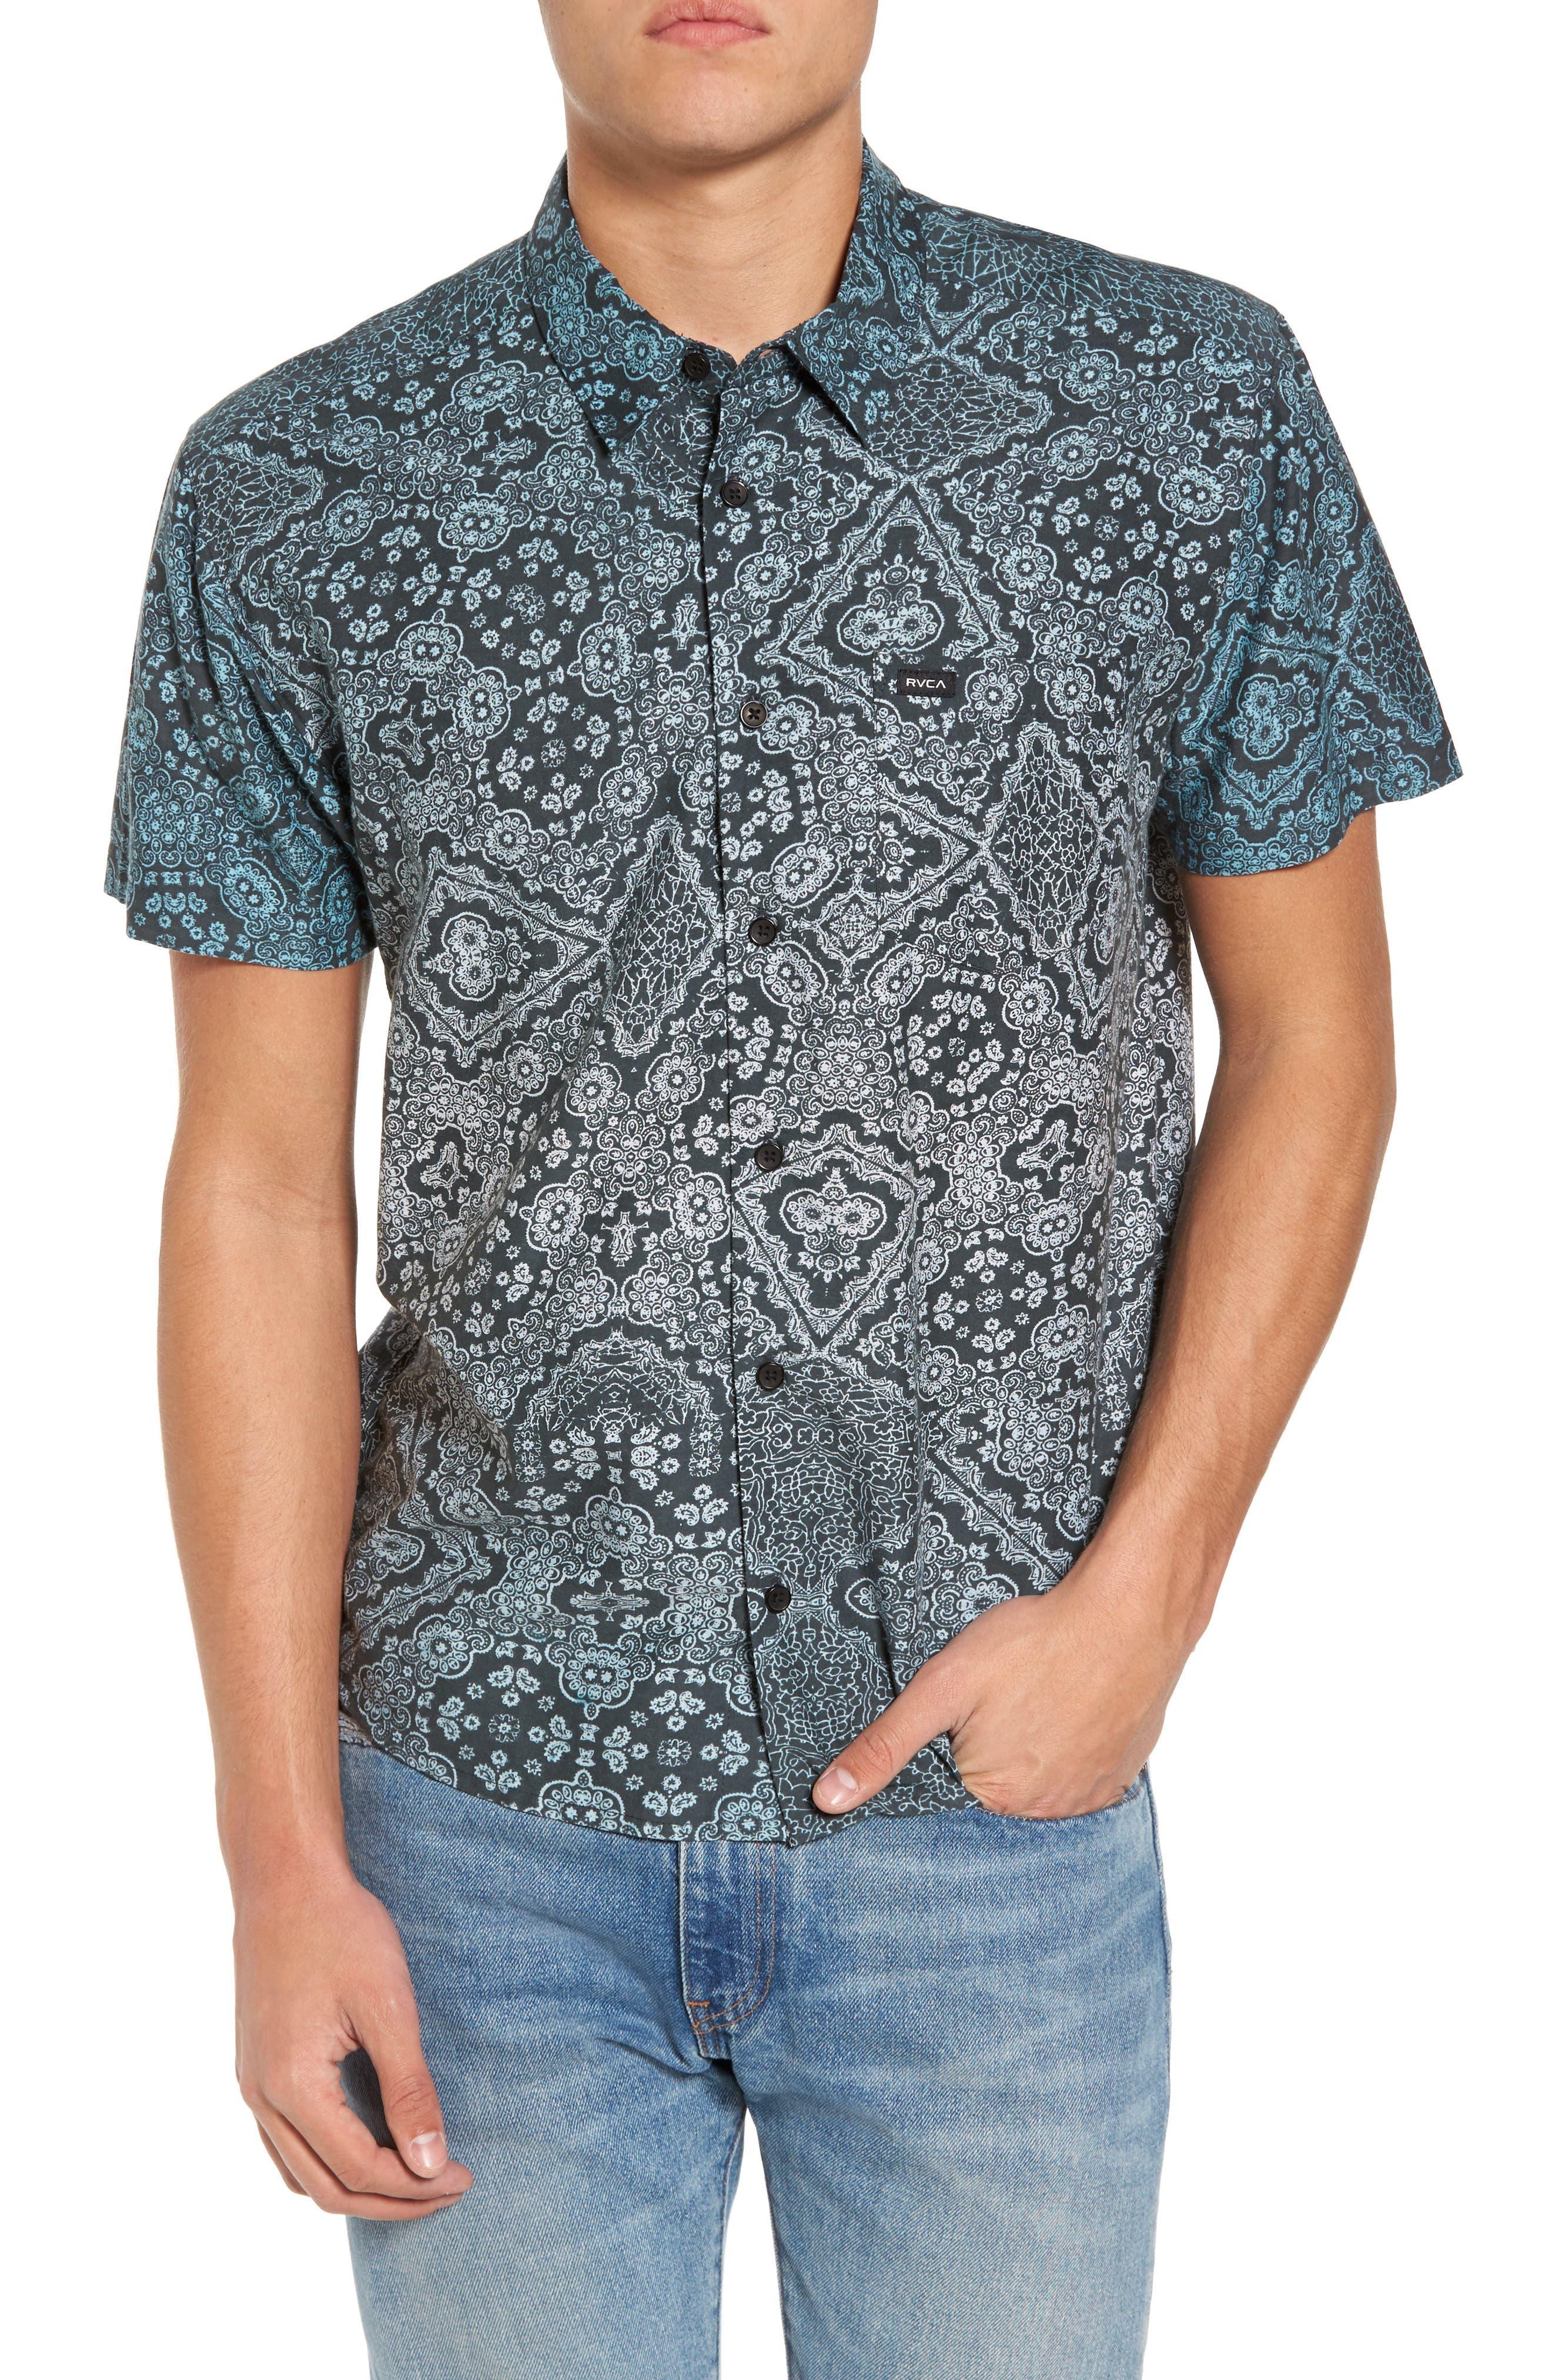 Alternate Image 1 Selected - RVCA I Like It Print Shirt